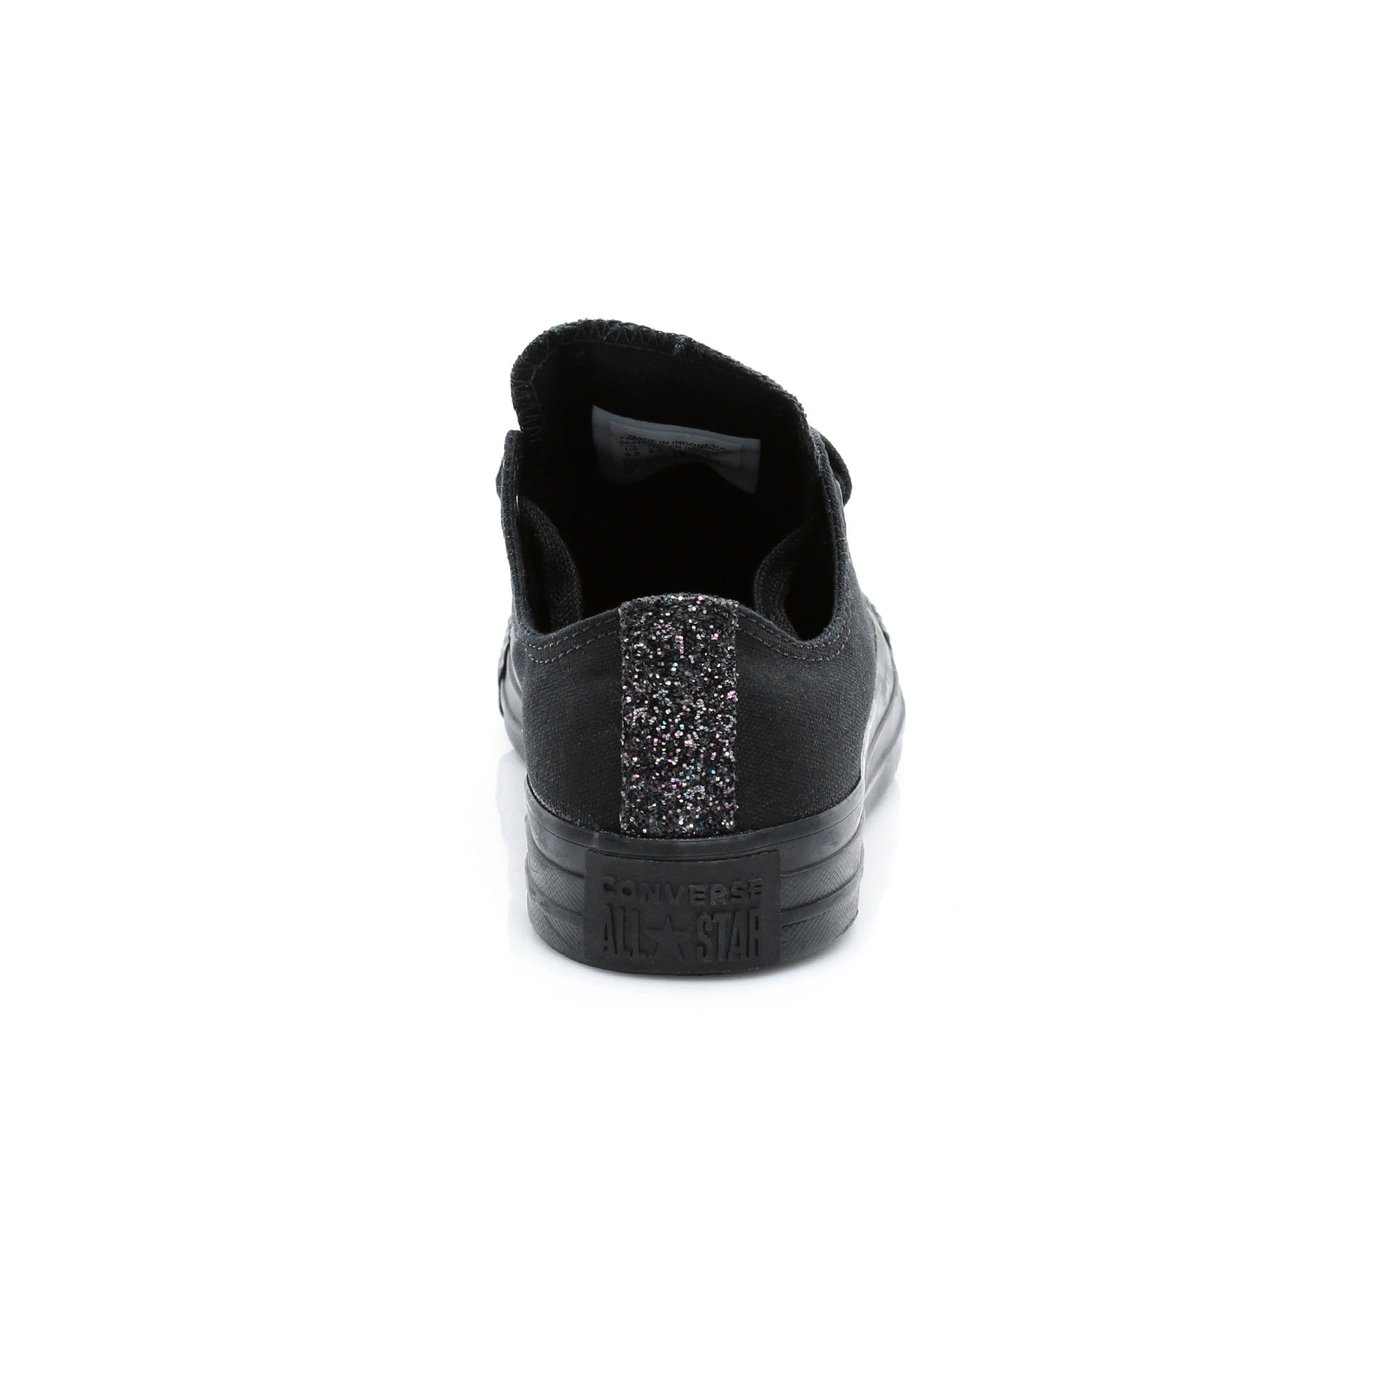 Converse Chuck Taylor All Star Sugar Charms Kadın Siyah Sneaker